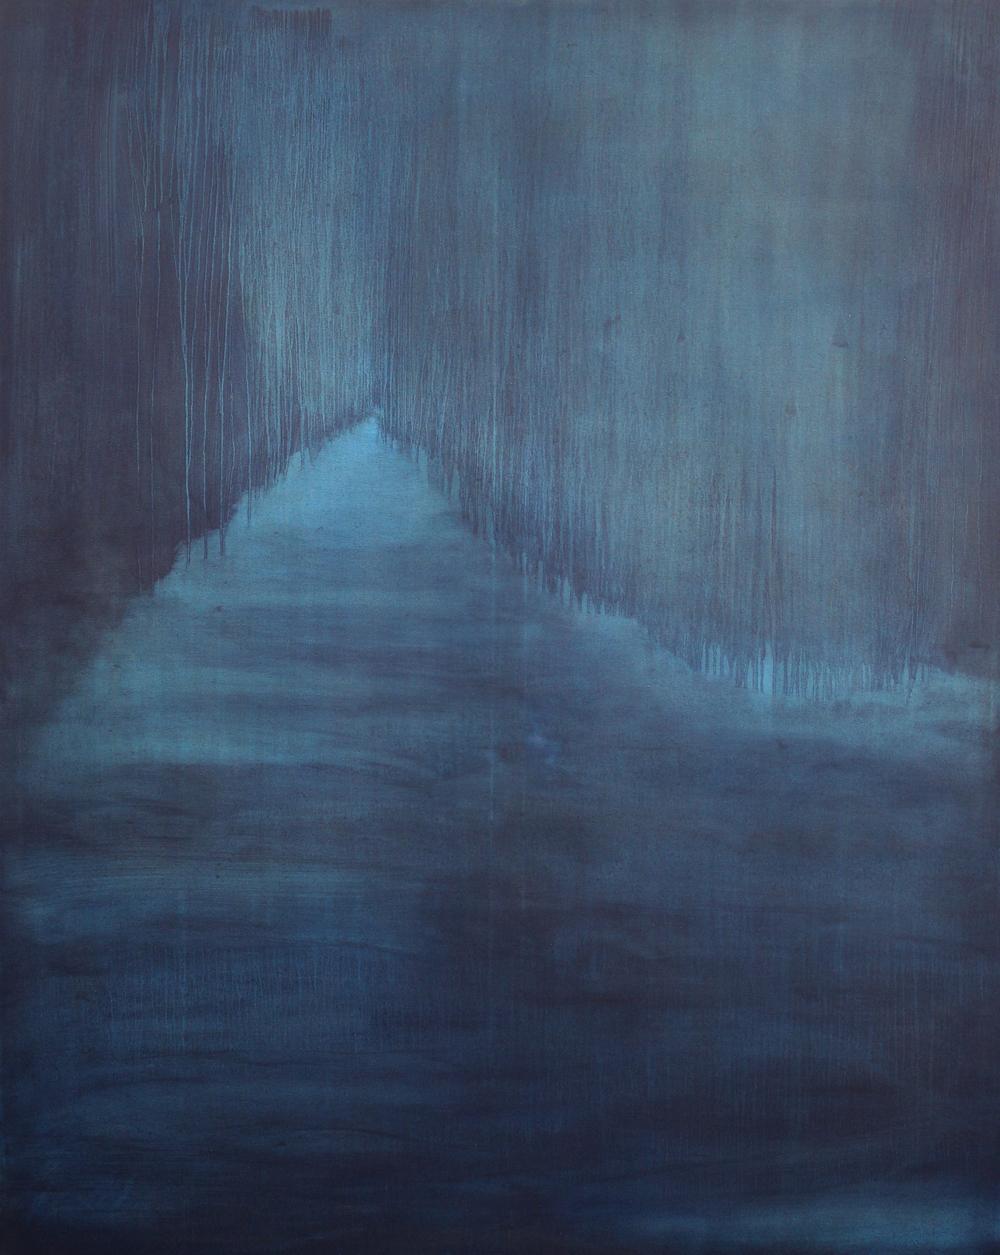 Lush, 2015, oil on canvas, 150 x 120cm